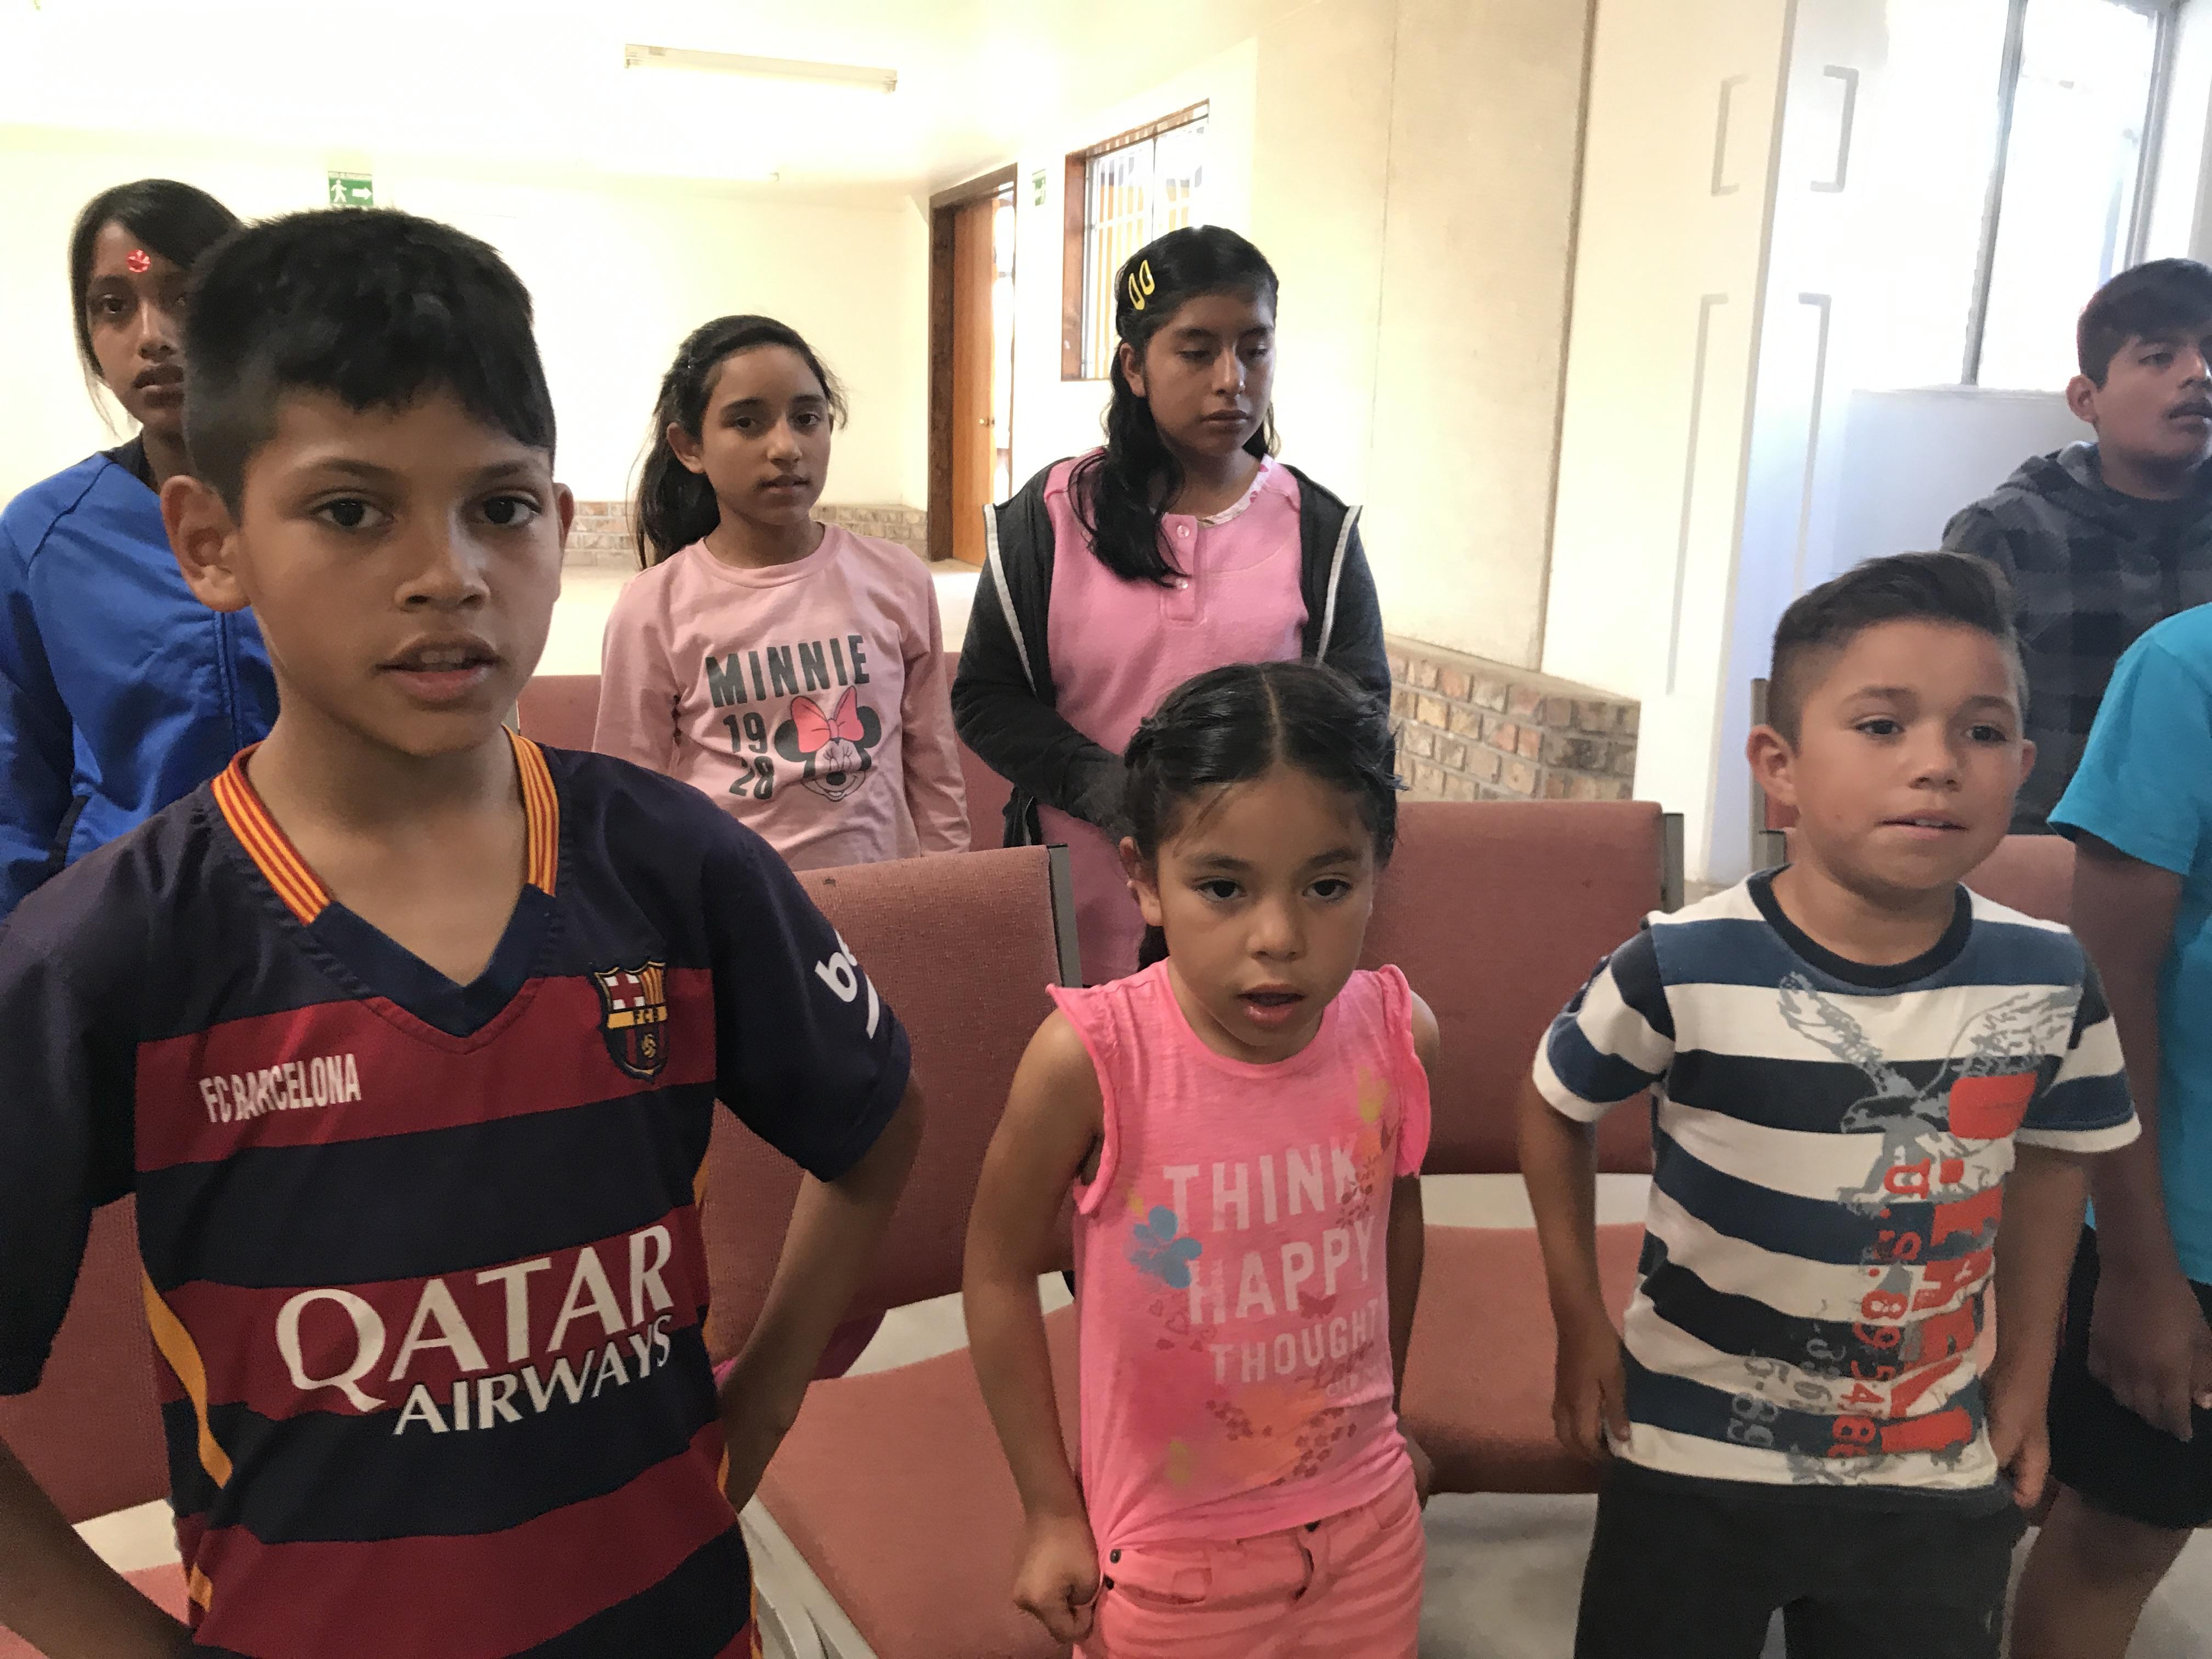 Reino orphanage rehearsal